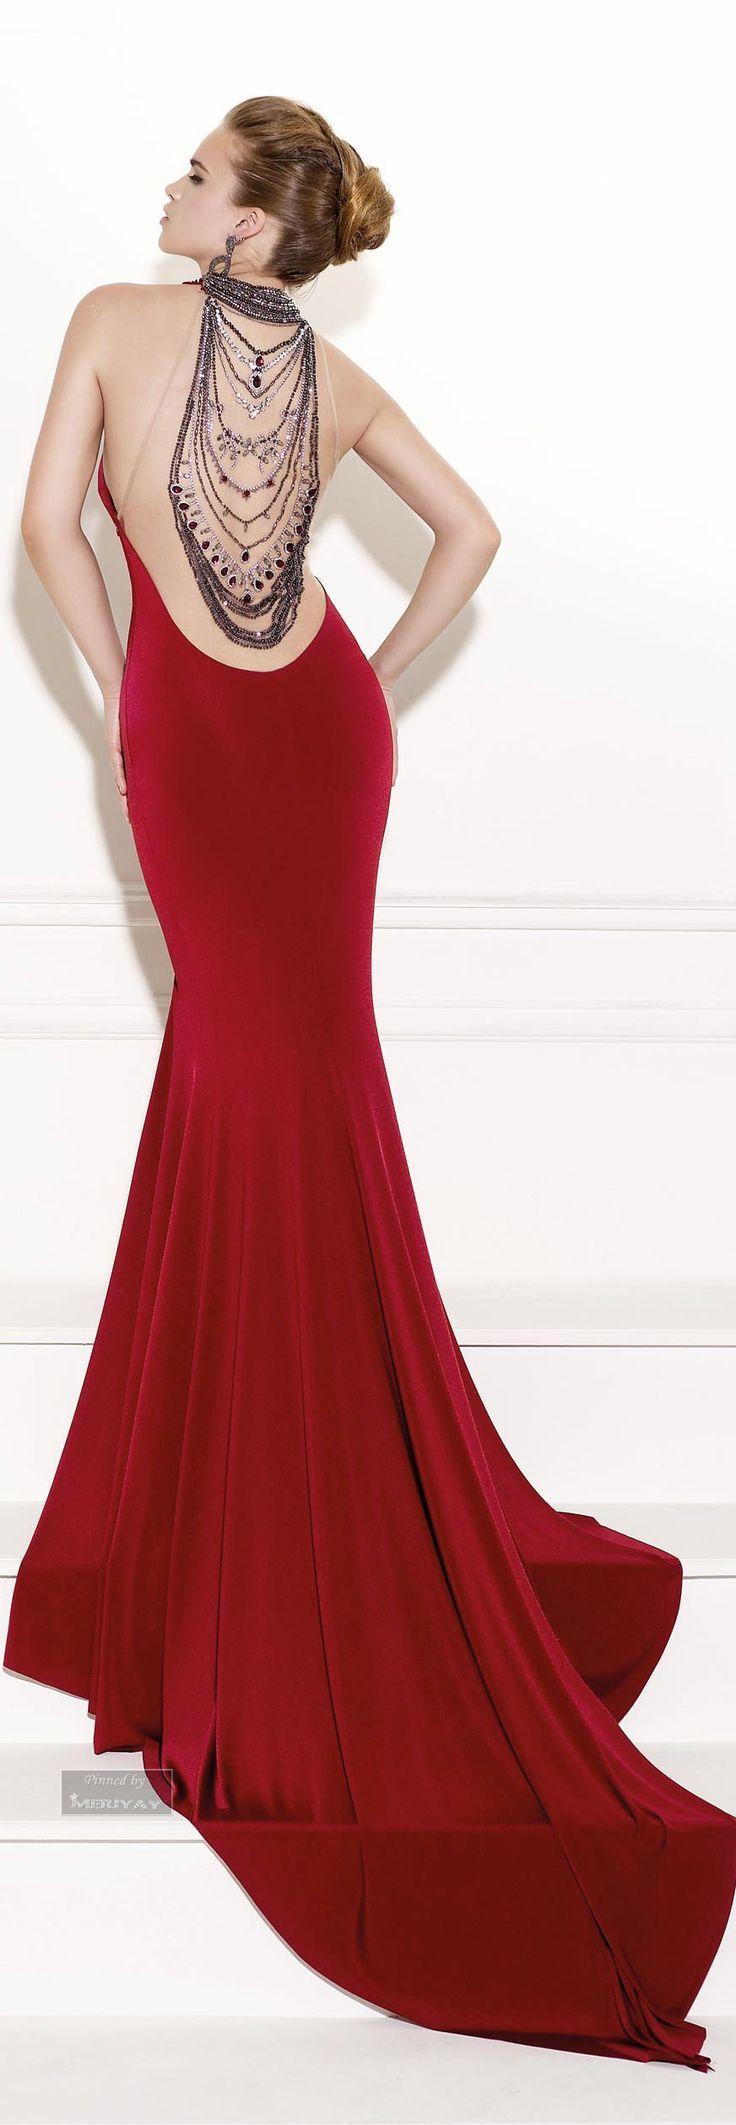 Tarik edizevening dress style and fashion pinterest